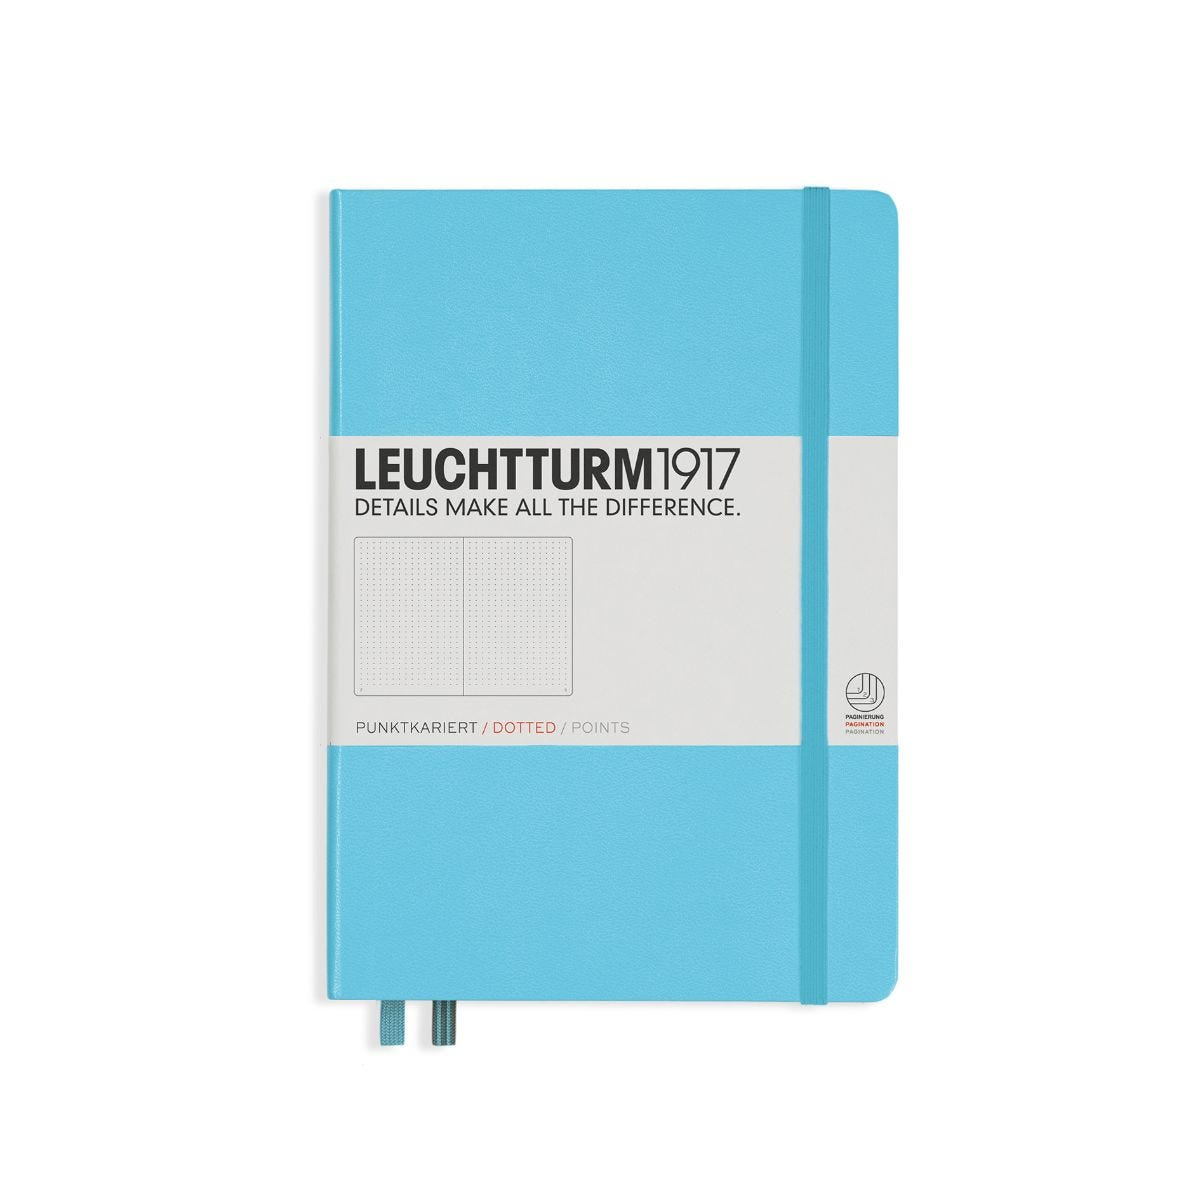 Notebooks Pads & Books Stationery - Ryman